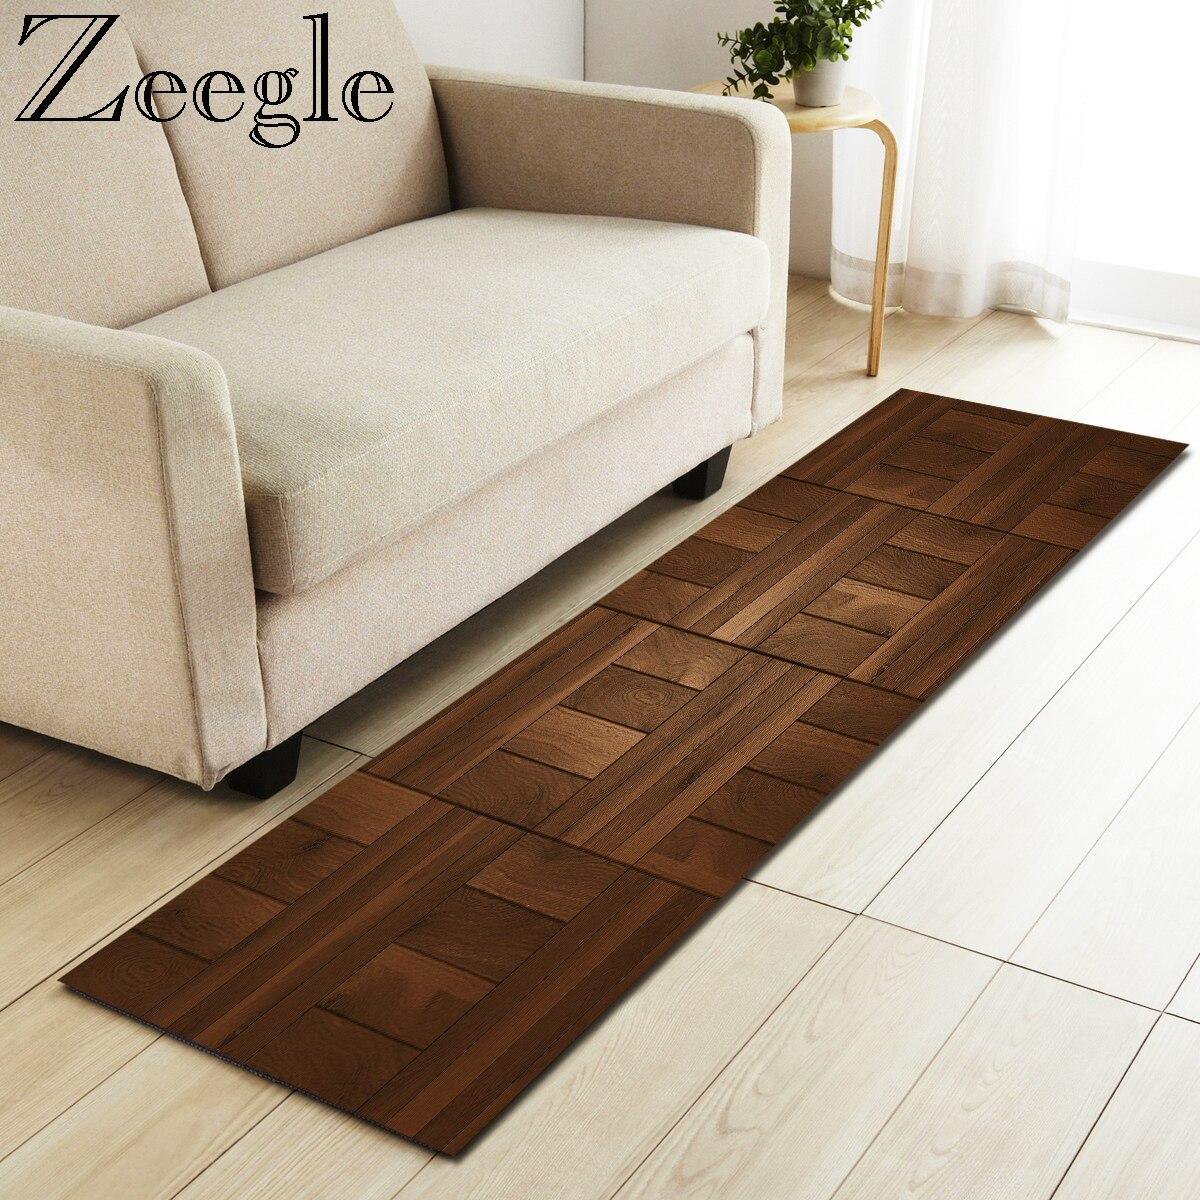 Zeegle Kitchen Floor Mat Praying Mats Non-slip Bedroom Rugs Bedside Mats Living Room Wood Painting Sofa Mat Long Kitchen Rug